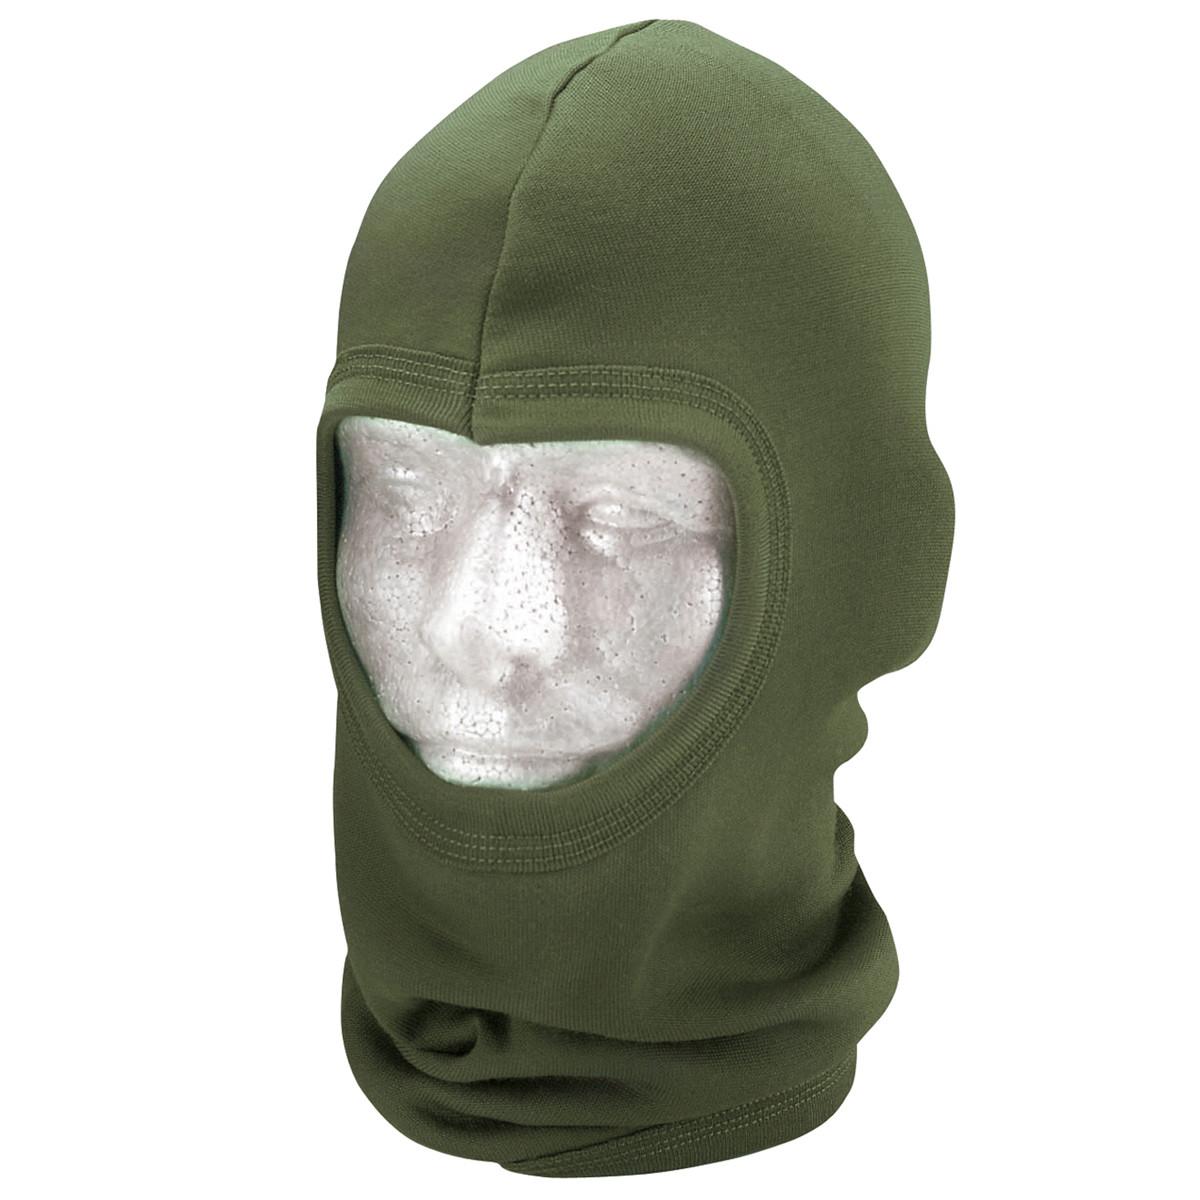 69a528bfea029 Shop Olive Drab Polypro Balaclavas - Fatigues Army Navy Gear